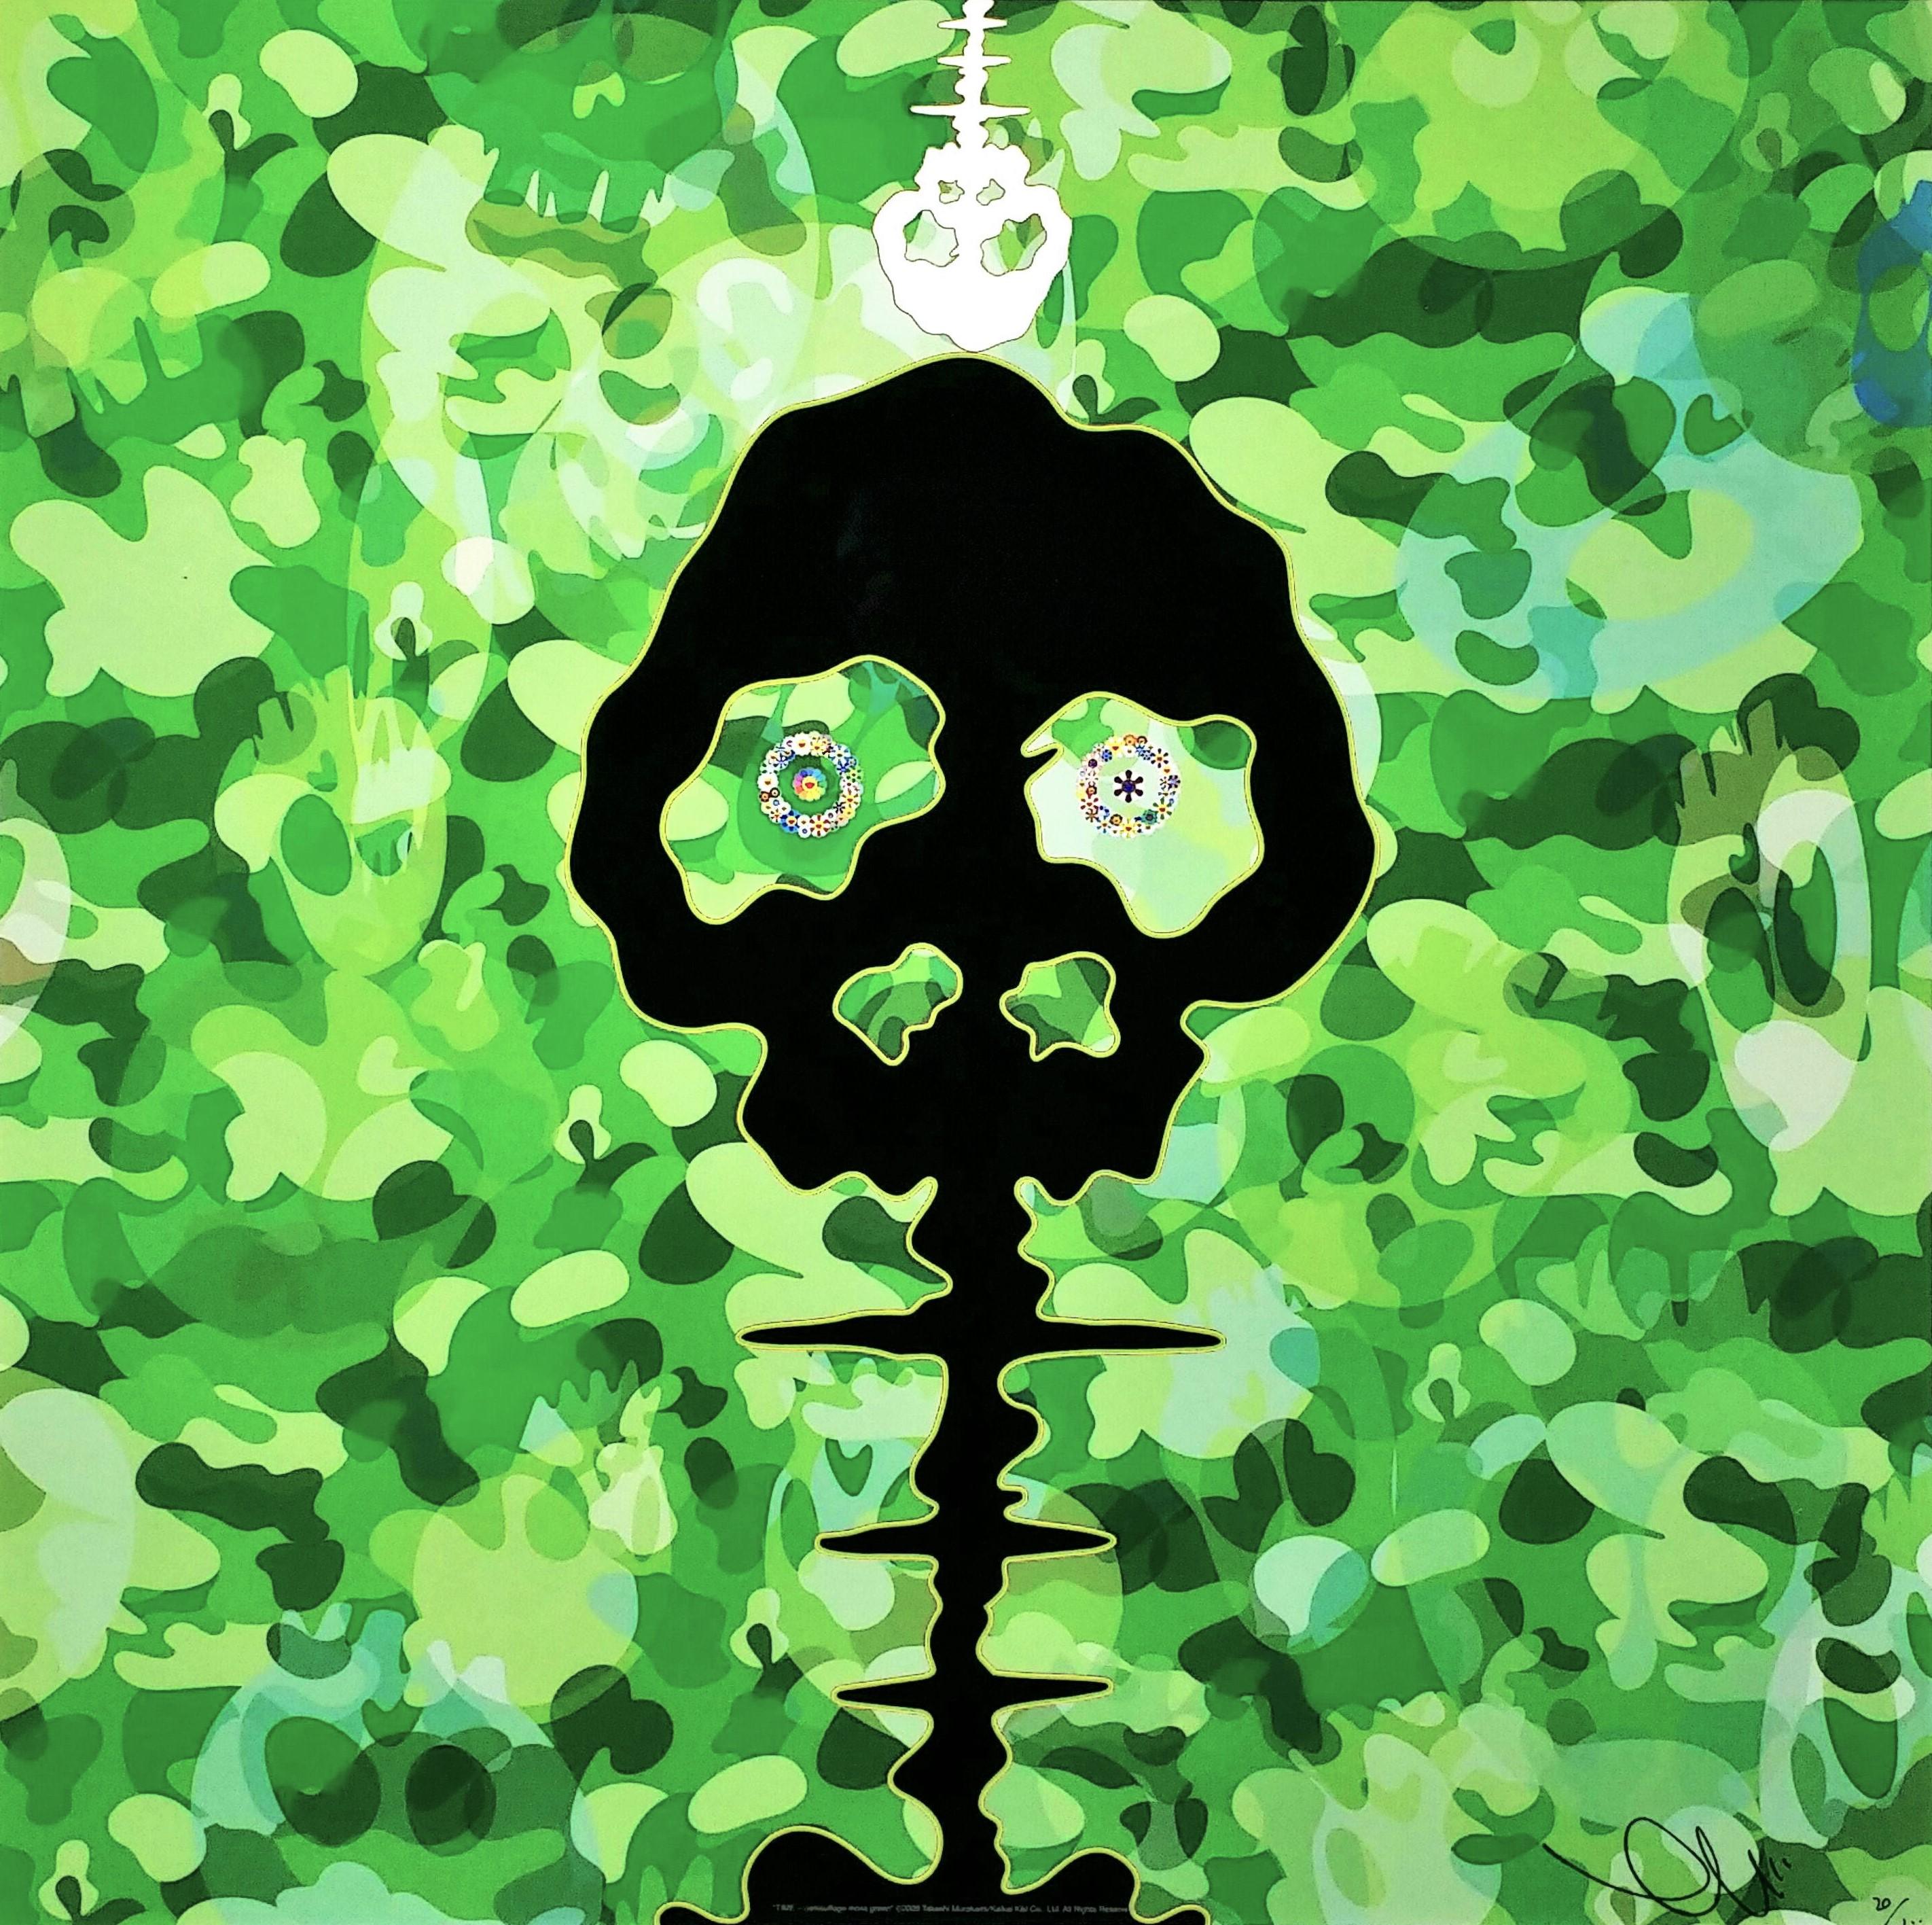 TIME-camouflage-moss-green」オフセットリトグラフ49×49cm1.jpg